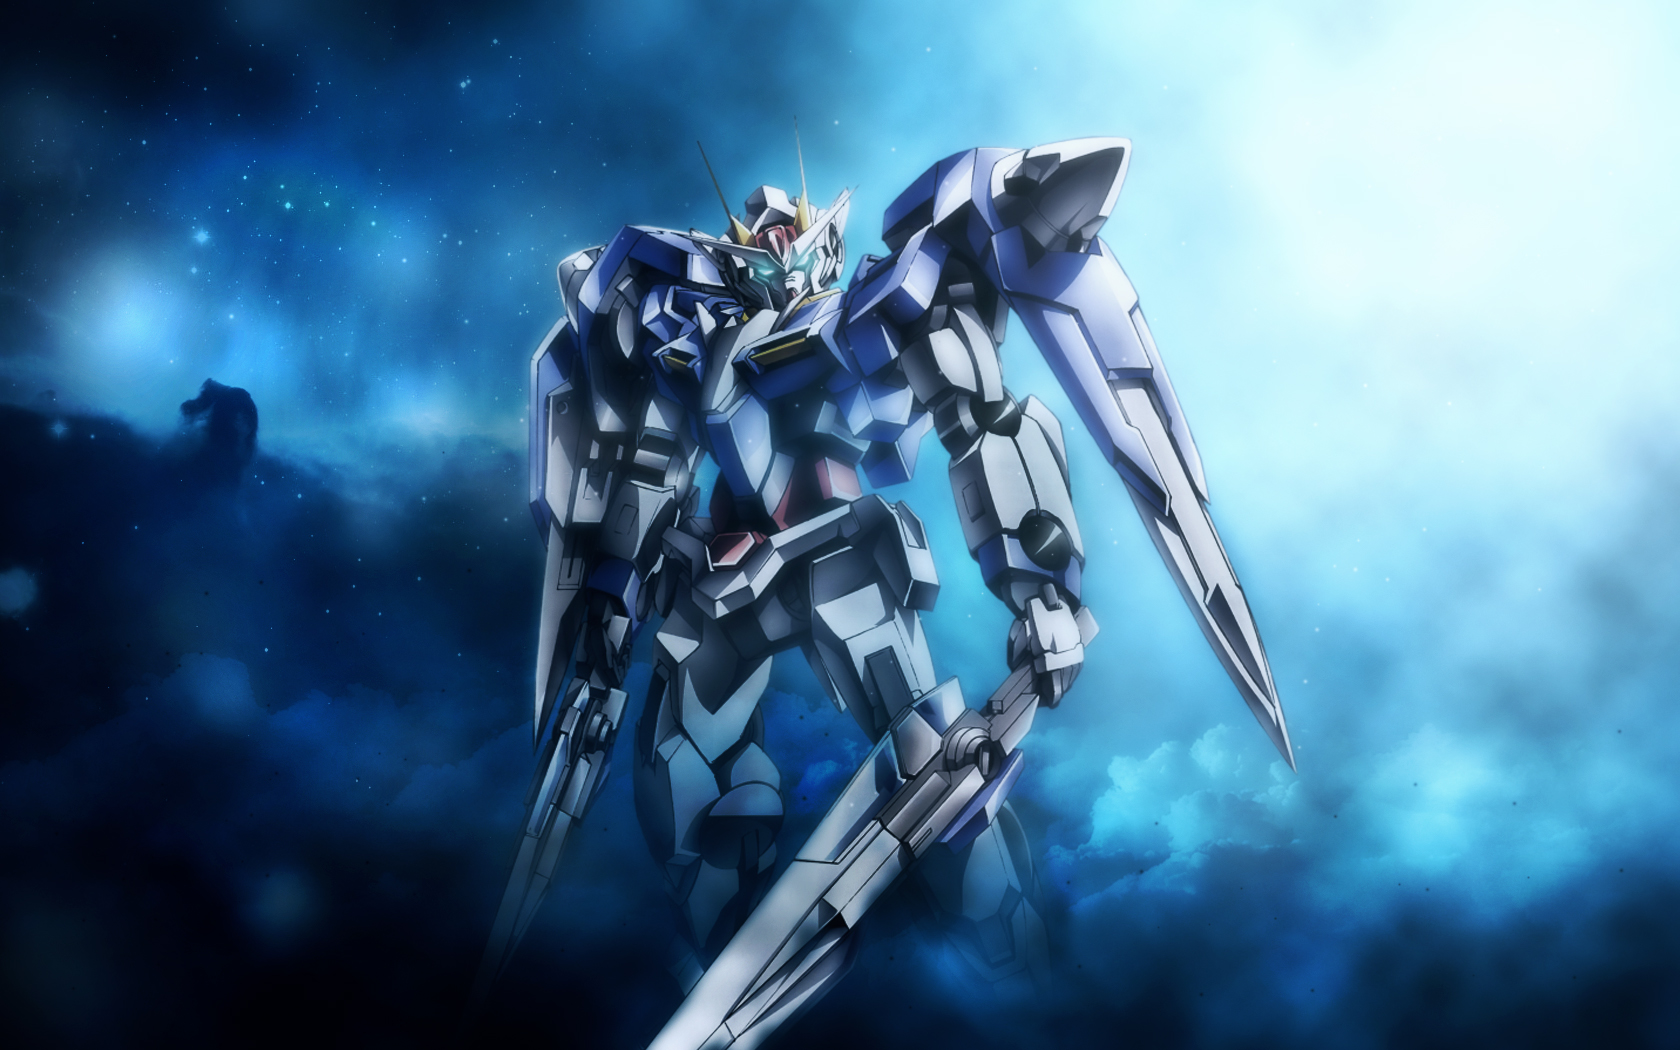 Gundam wallpaper and background image 1680x1050 id 74902 - Gundam wallpaper hd ...